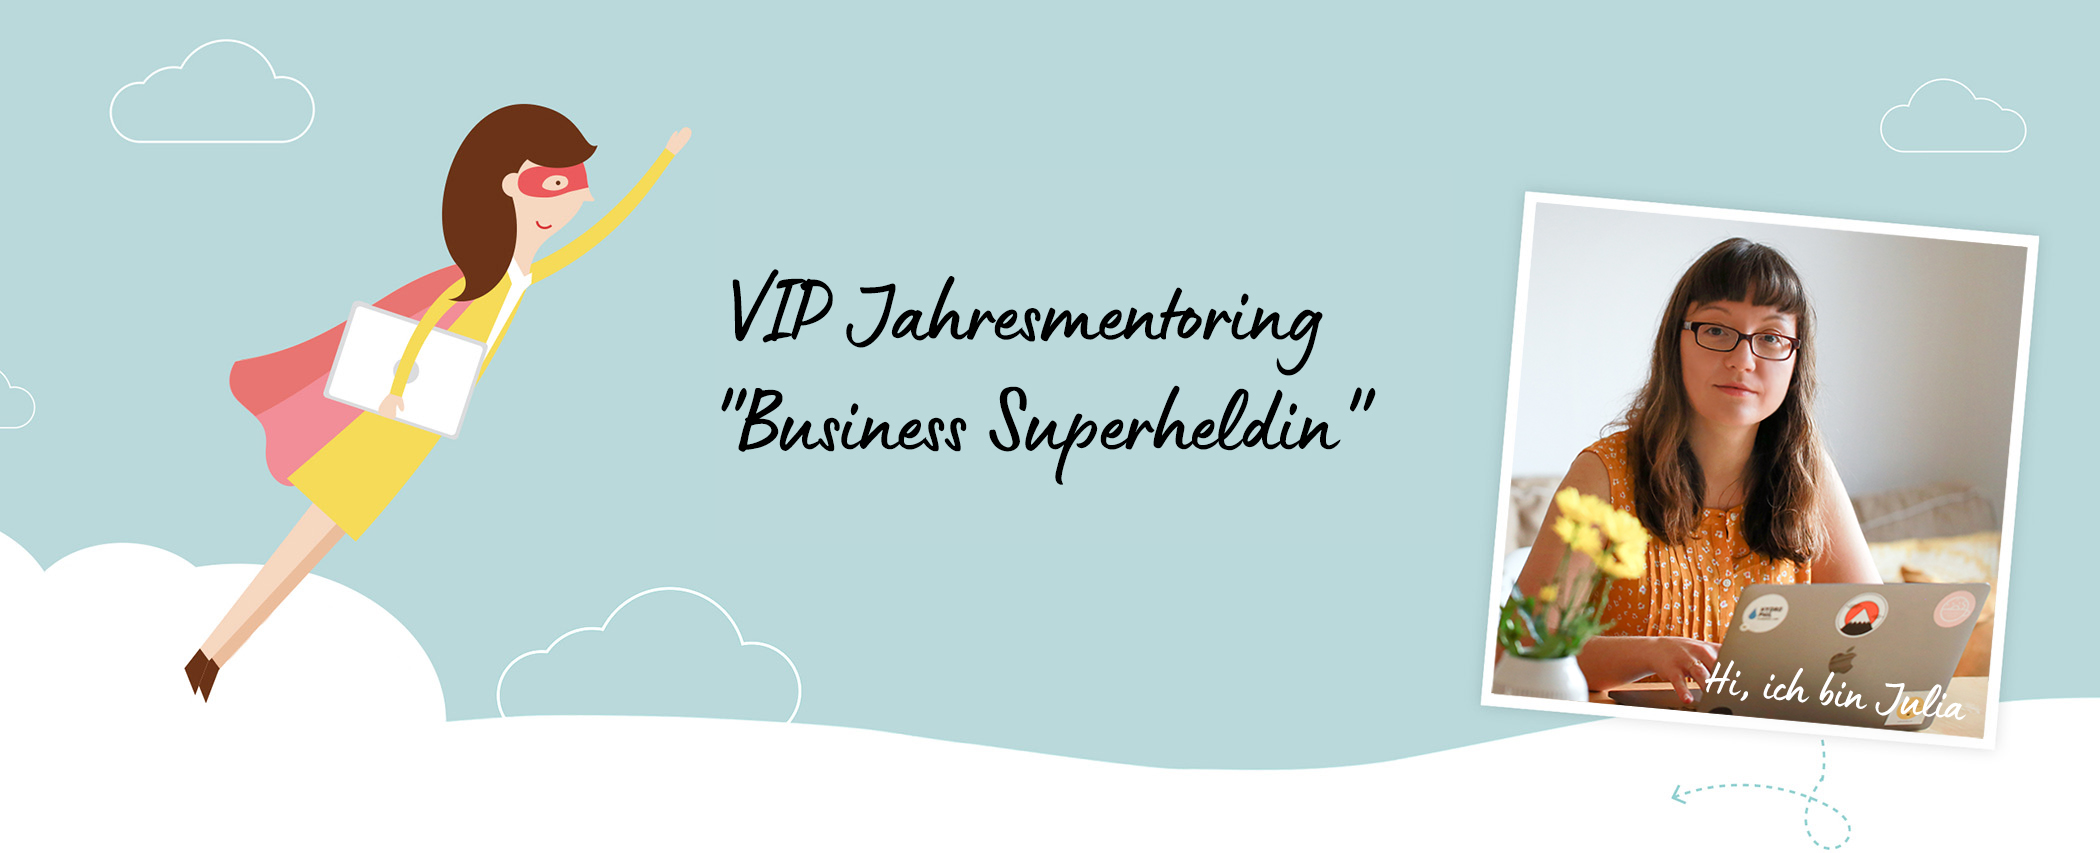 1 Jahr lang volles VIP-Empowerment & Business-Wissen